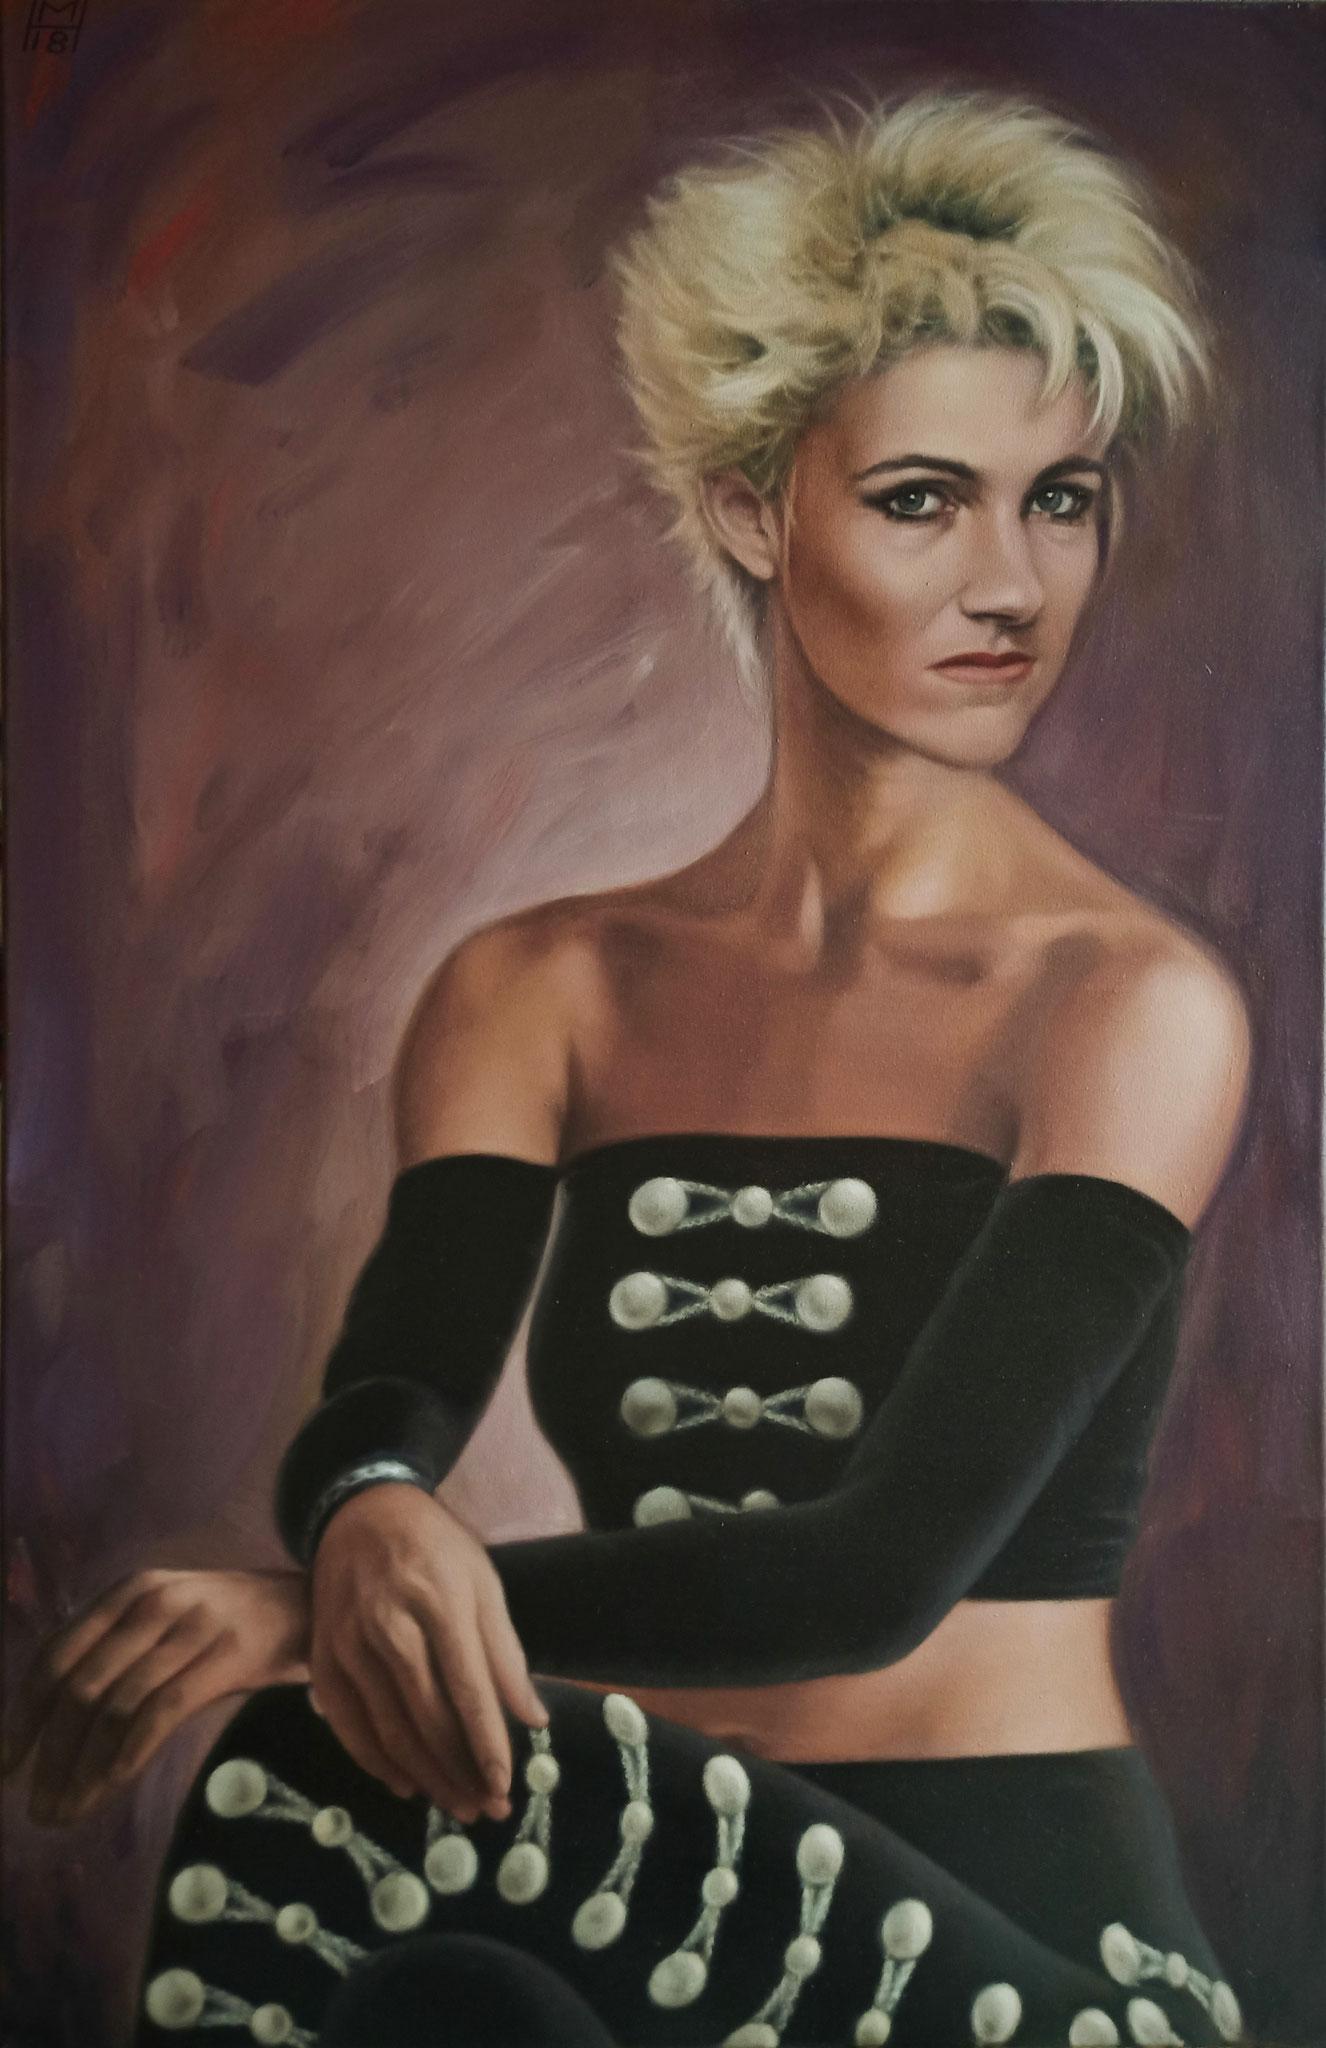 Marie Fredriksson, Öl auf Leinwand, 65 x 100 cm